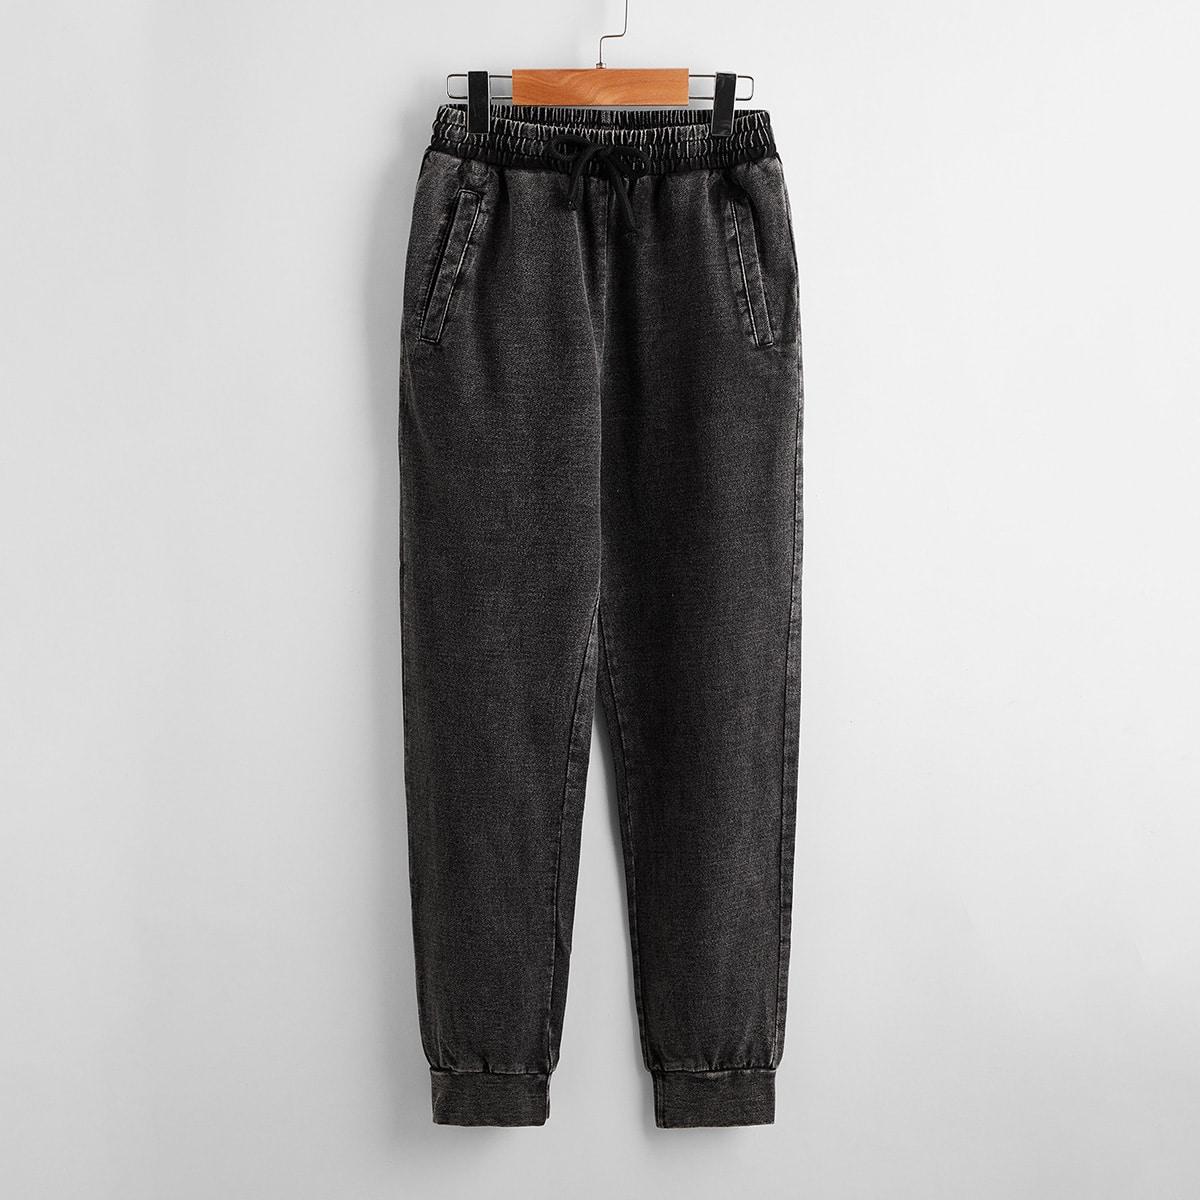 Boys Drawstring Waist Pocket Detail Solid Pants